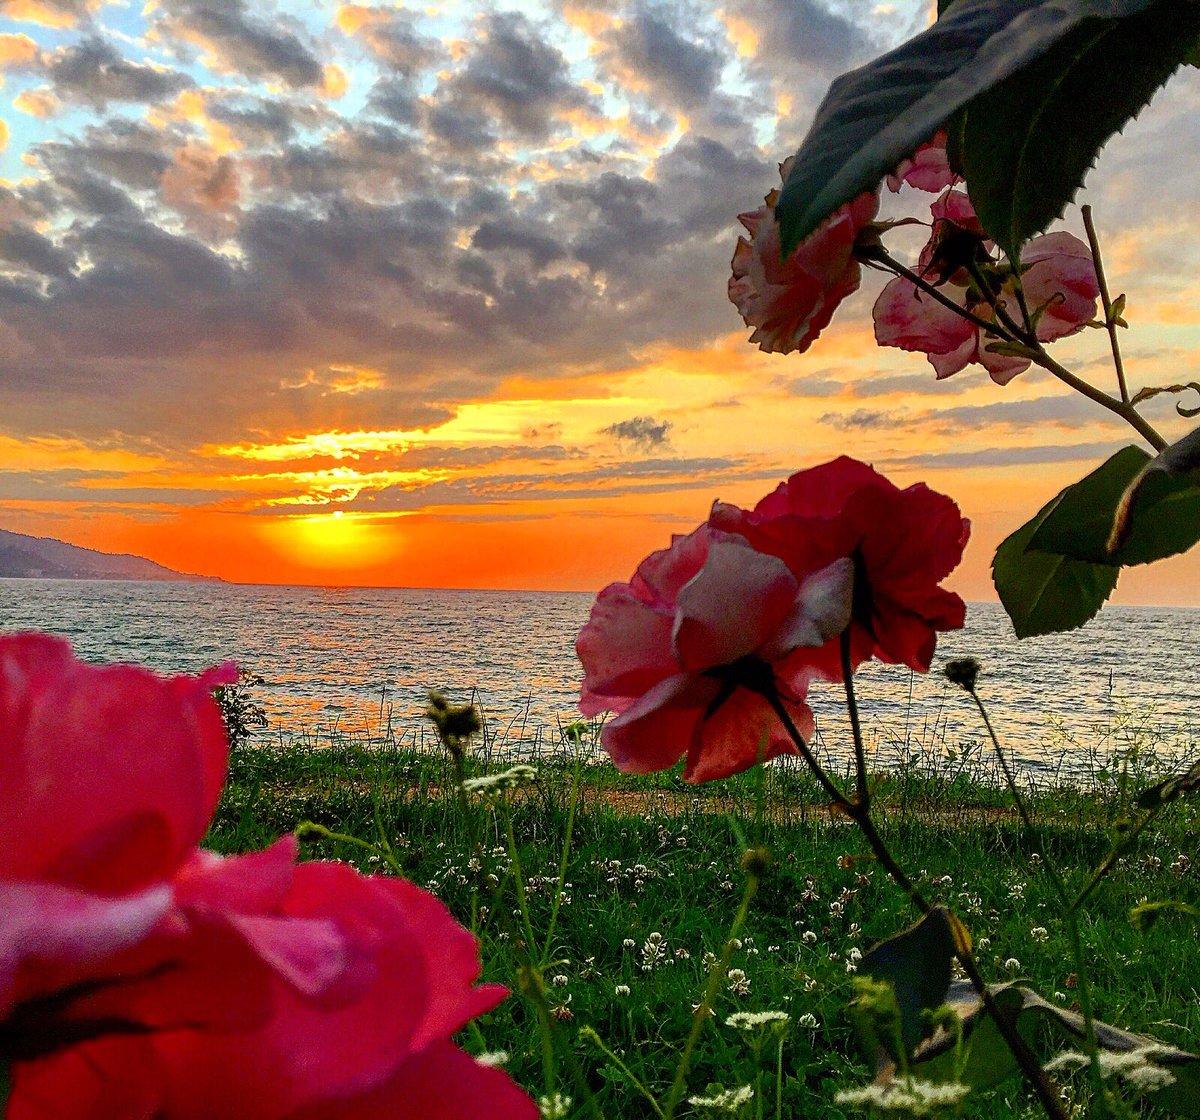 JFB? 𝒓𝒐𝒔𝒂. on Twitter: 로제 업데이트; #nature #sky #sea #beach #beautiful #pretty  #flowers #rose #green #white #clouds #beauty #love #view #peace #Sunset  #Sunsetlovers #Naturelovers #myphoto